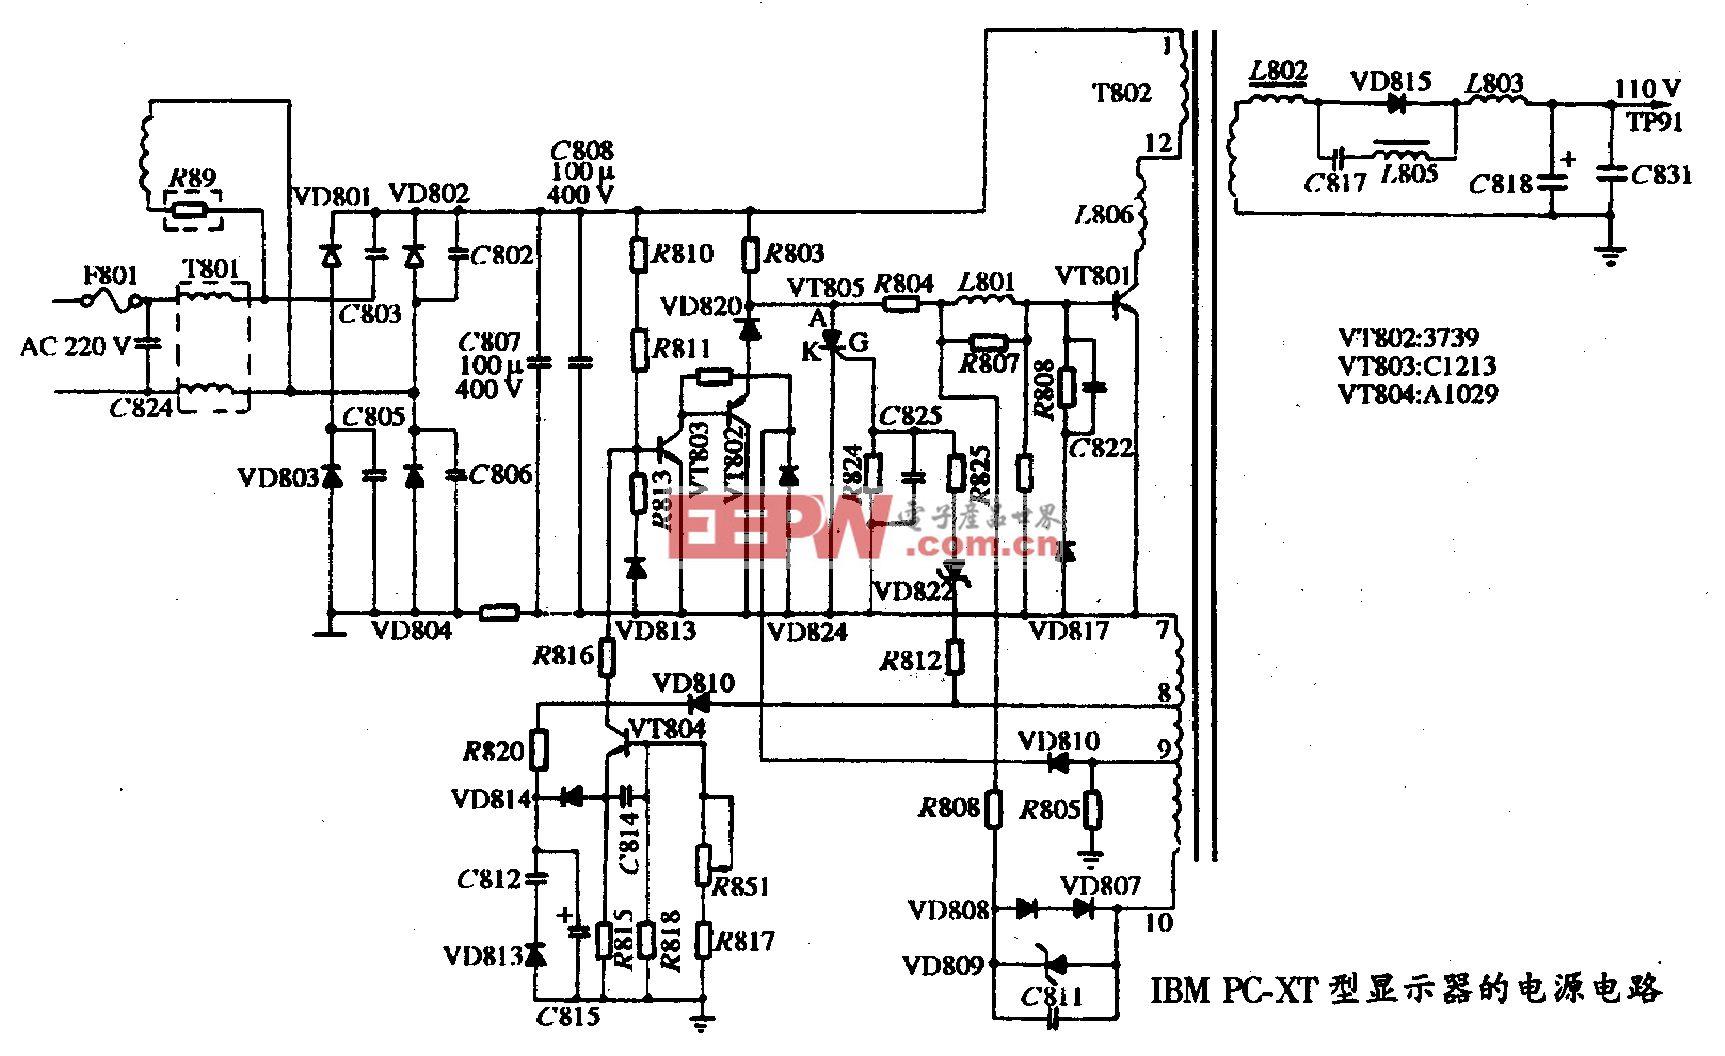 63、IBM PC-XT型顯示器的電源電路圖